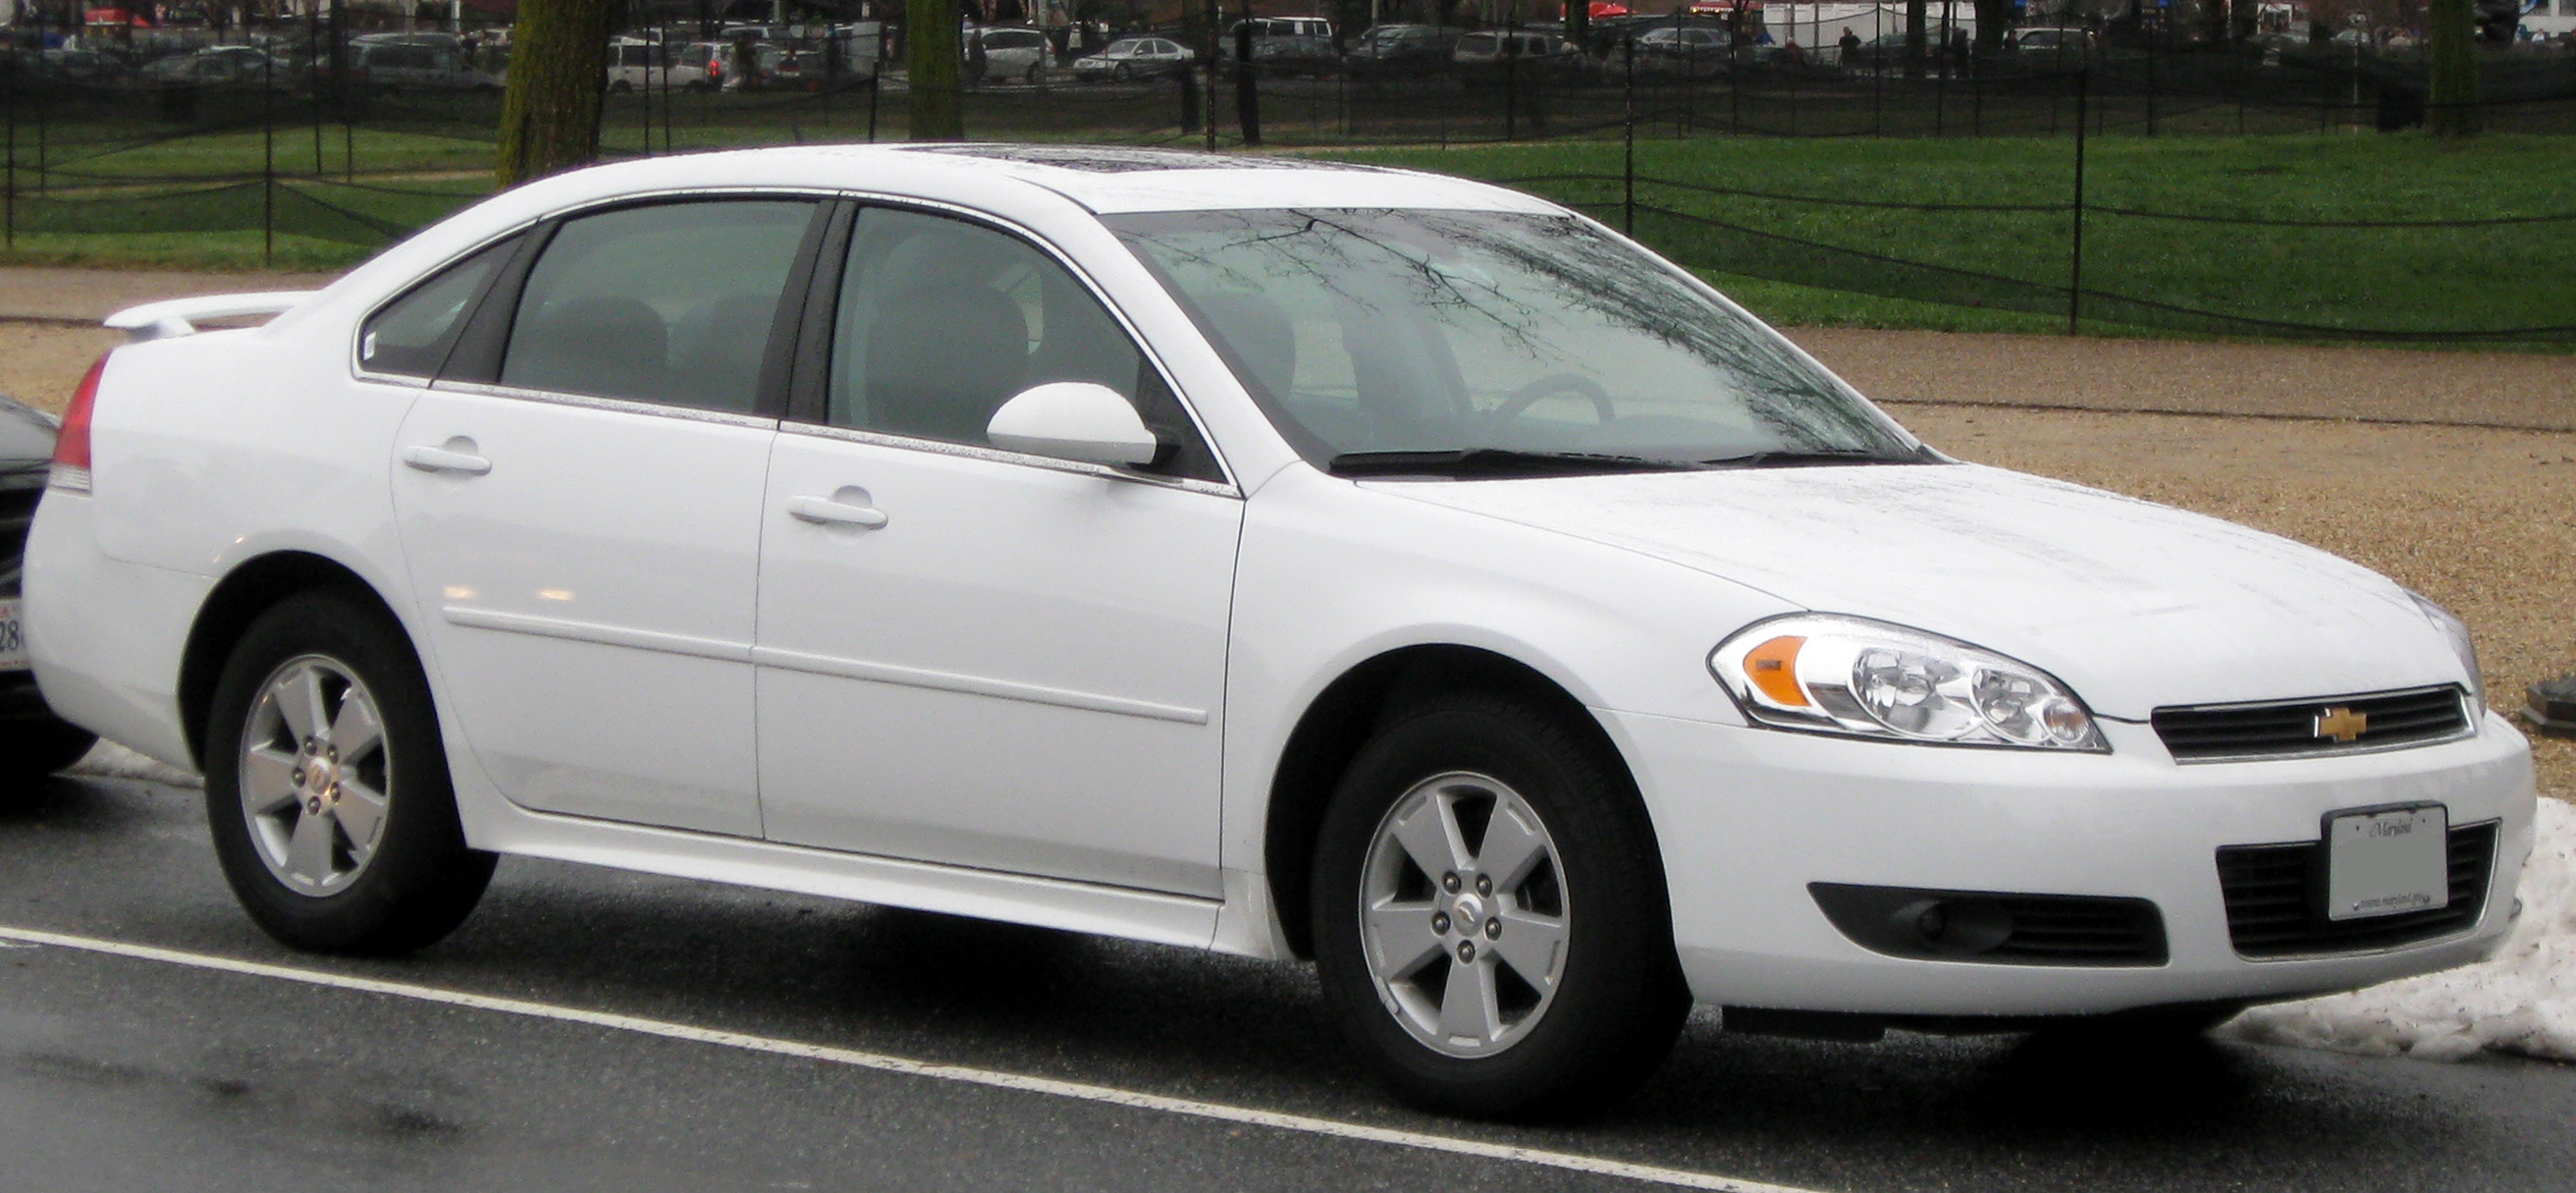 Chevrolet Chevy 2000 foto - 1